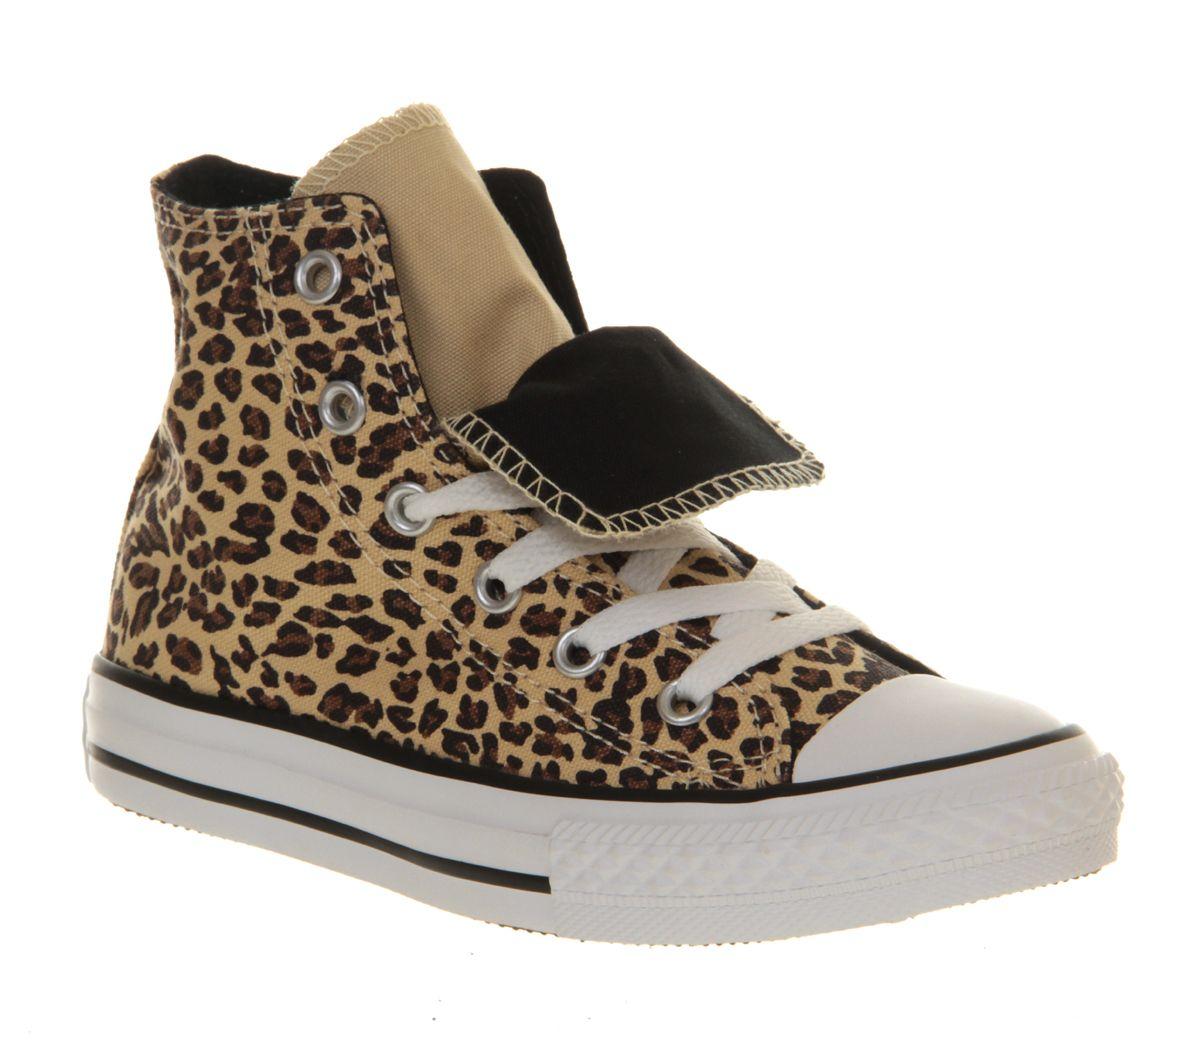 For the girls  Office -Converse Double Tongue Hi Kids Leopard ... 61cab0c3d